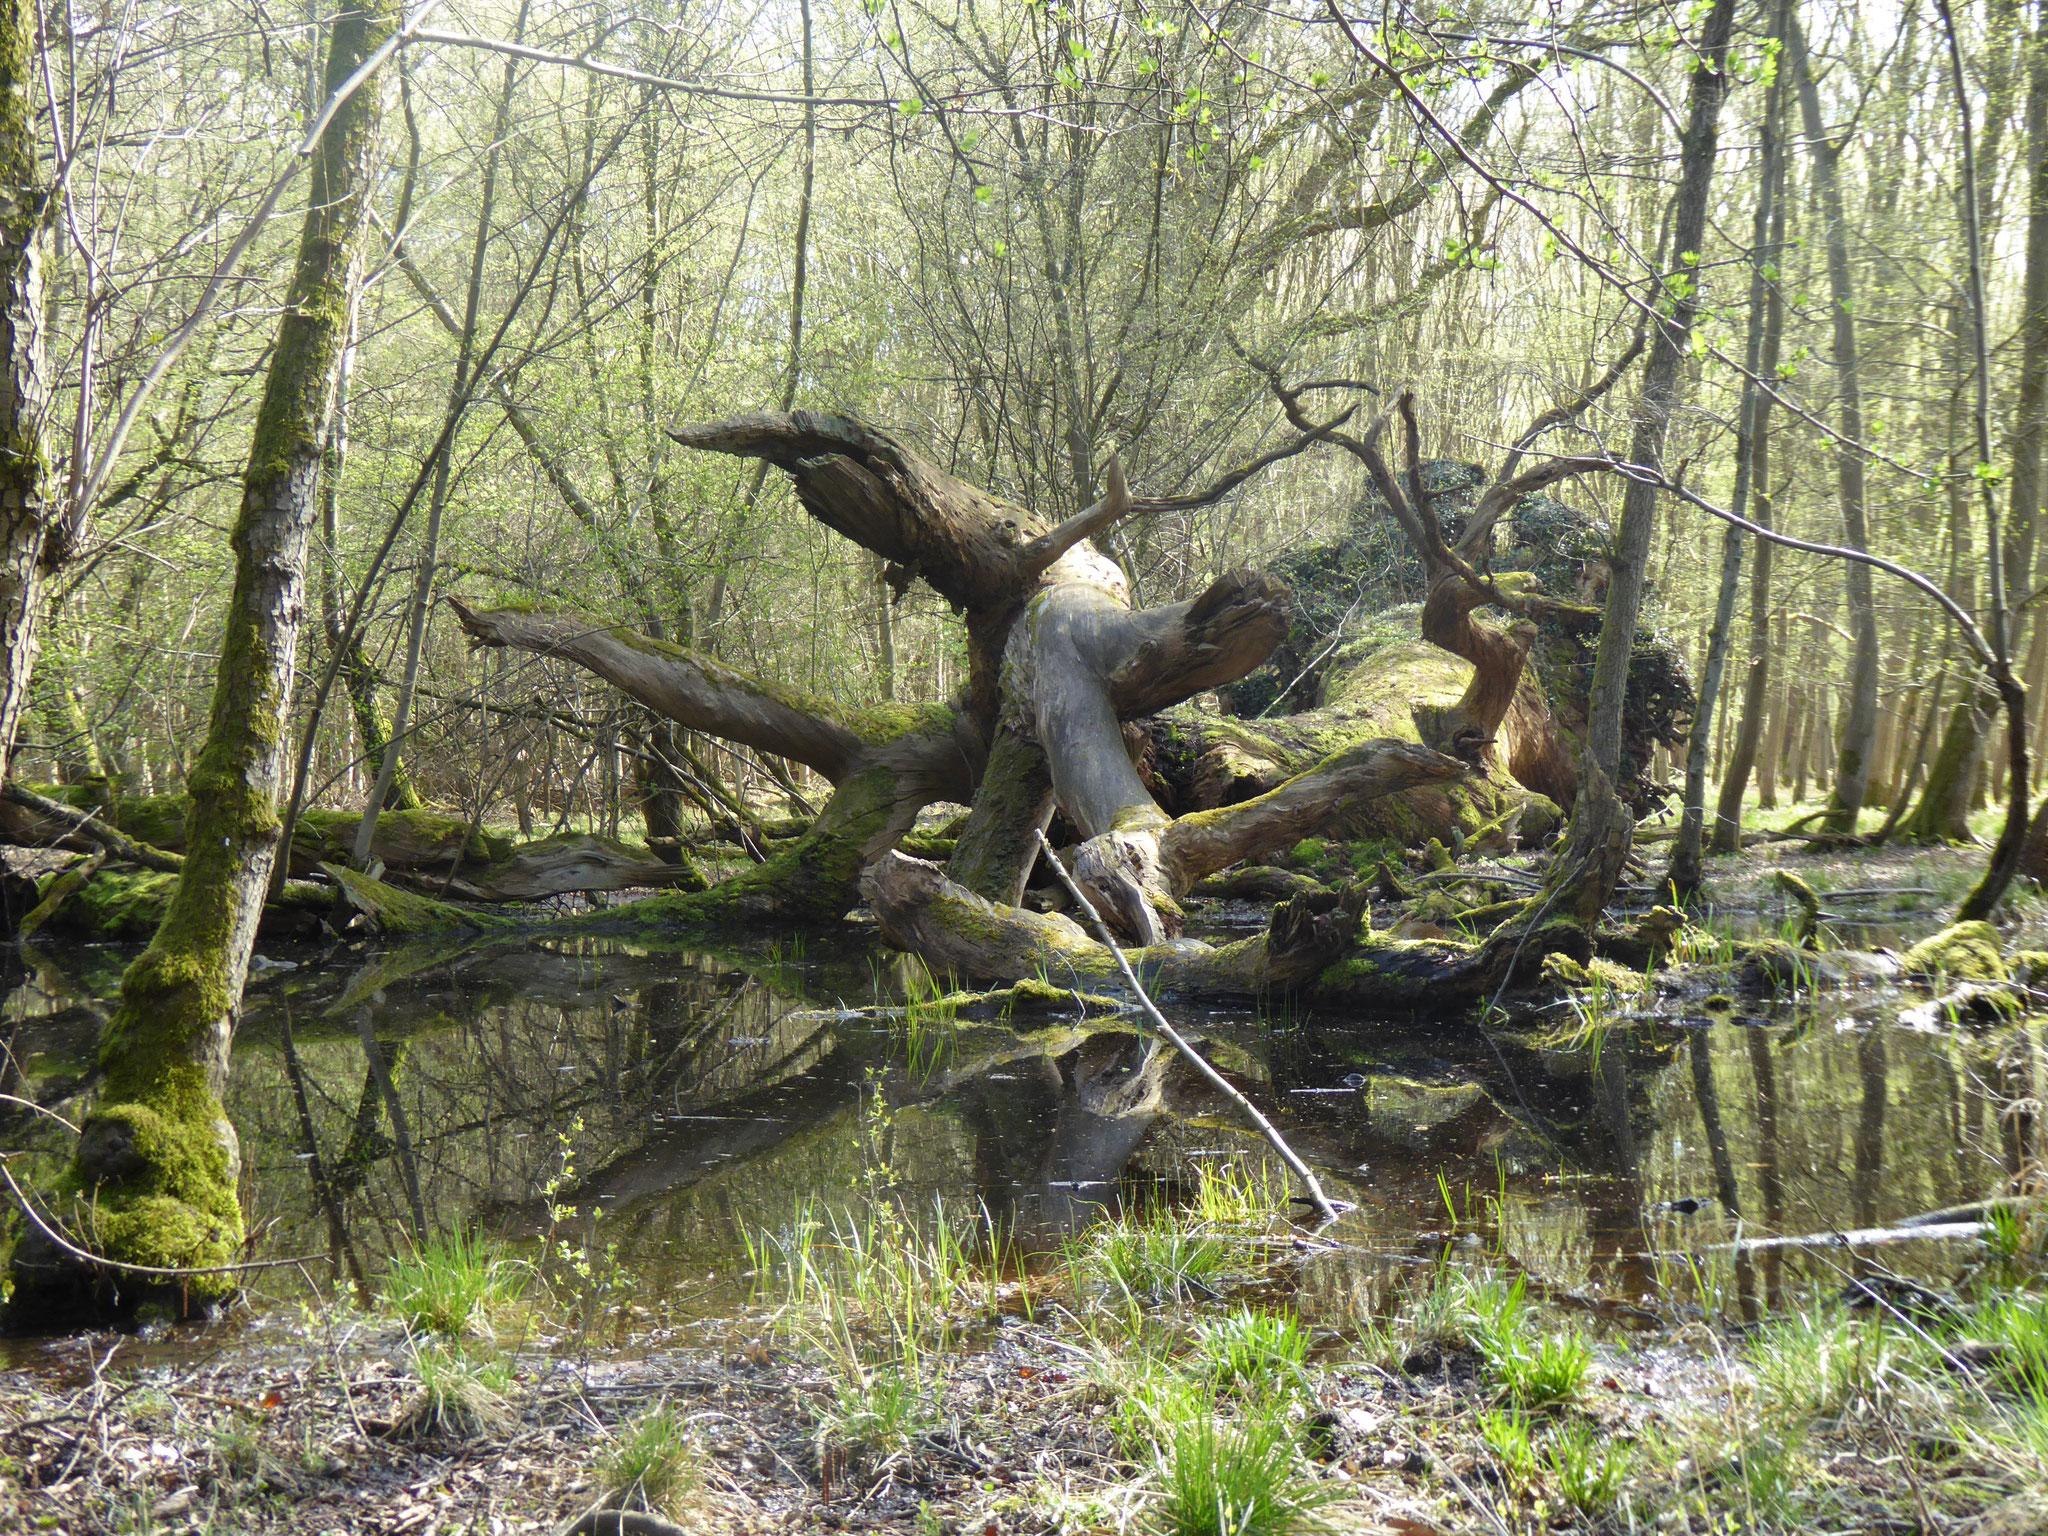 Totholz im Sauerbruch, Groß-Gerau-Nord  (Foto: NABU GG)